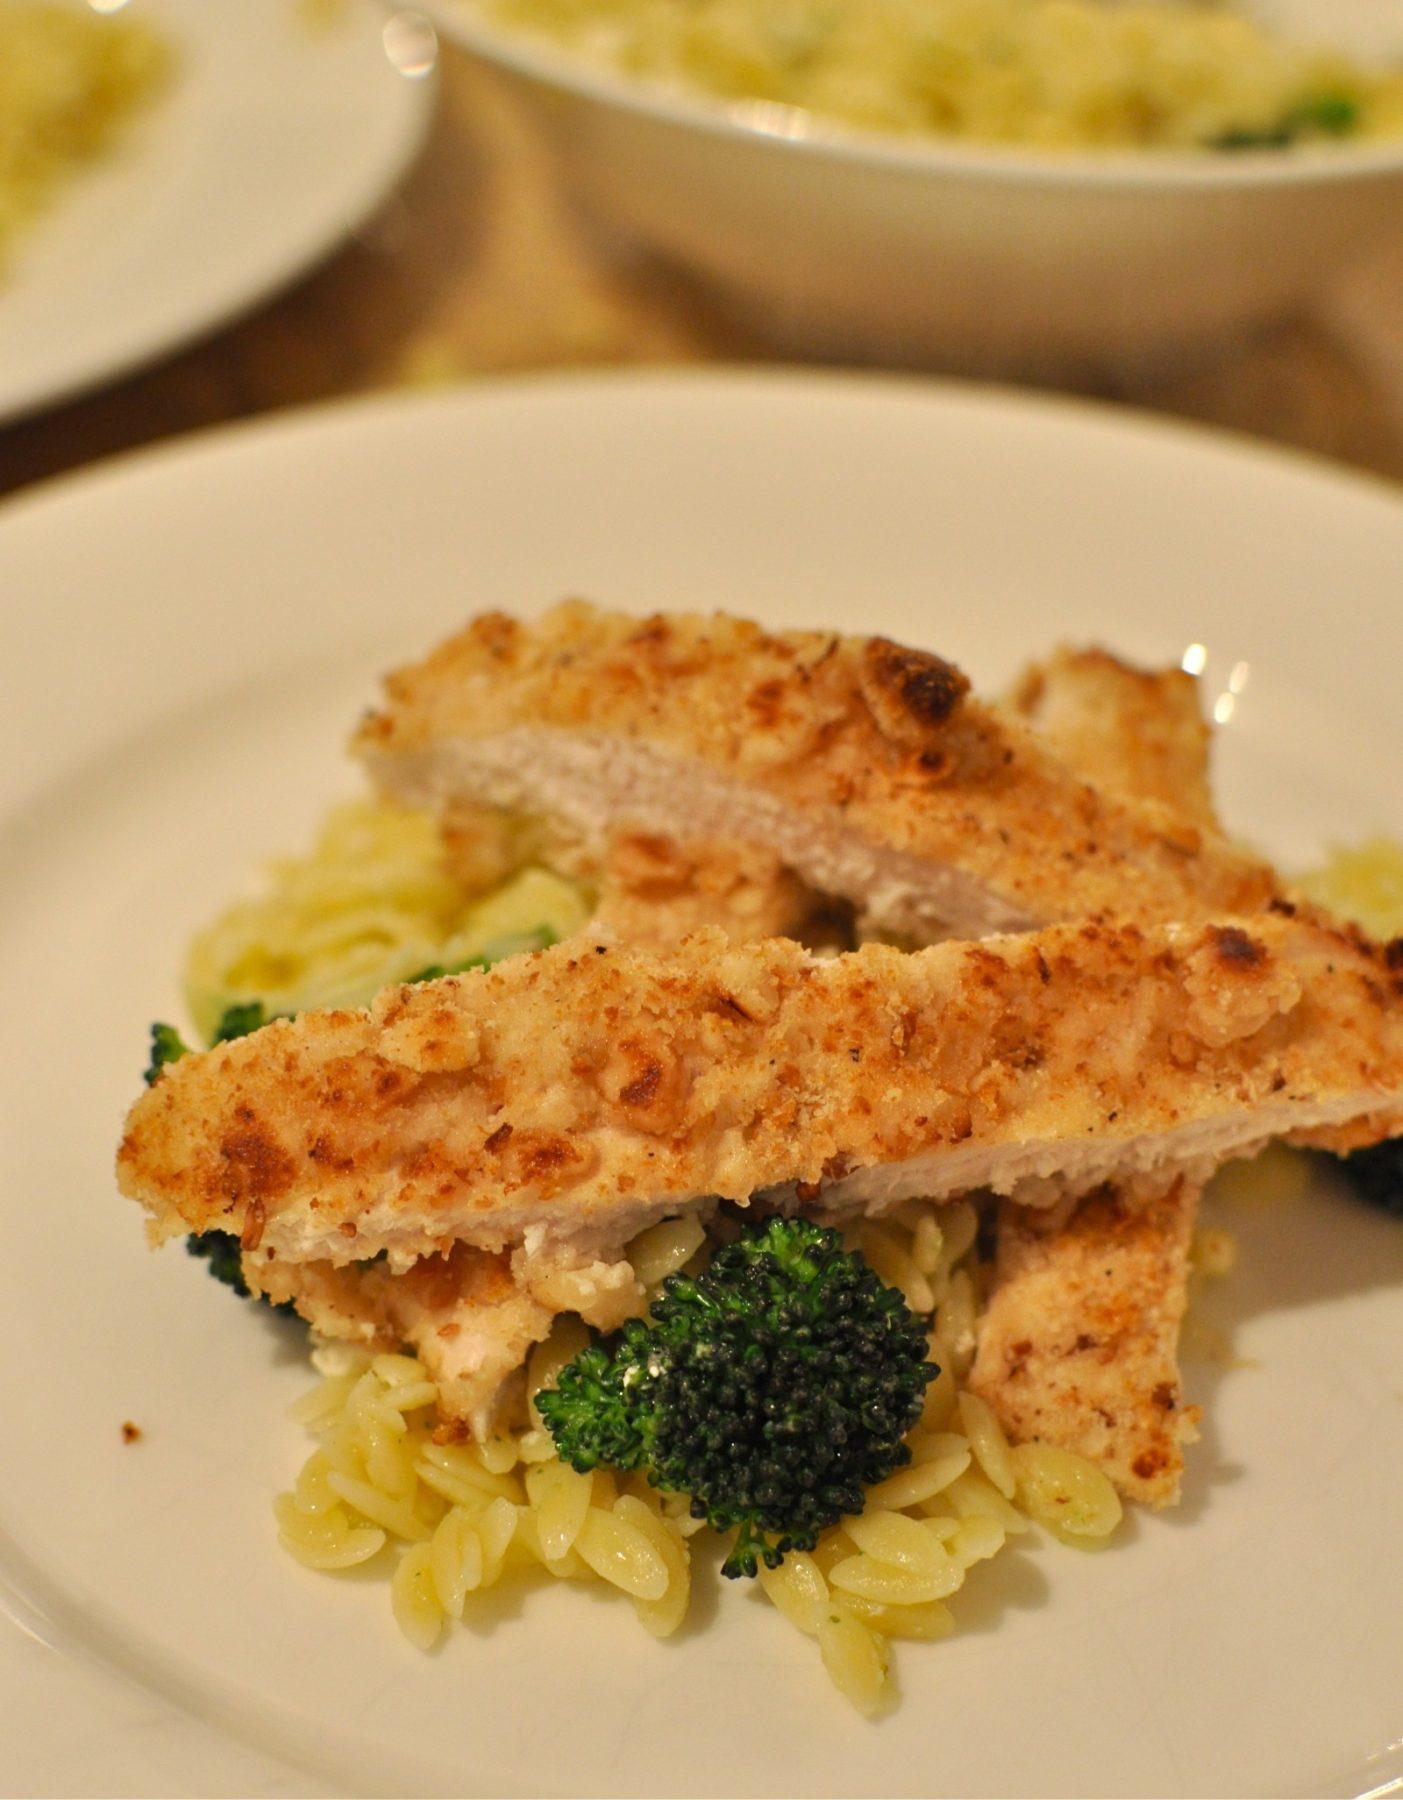 Macadamia crumbed chicken – my perfect chicken schnitzel